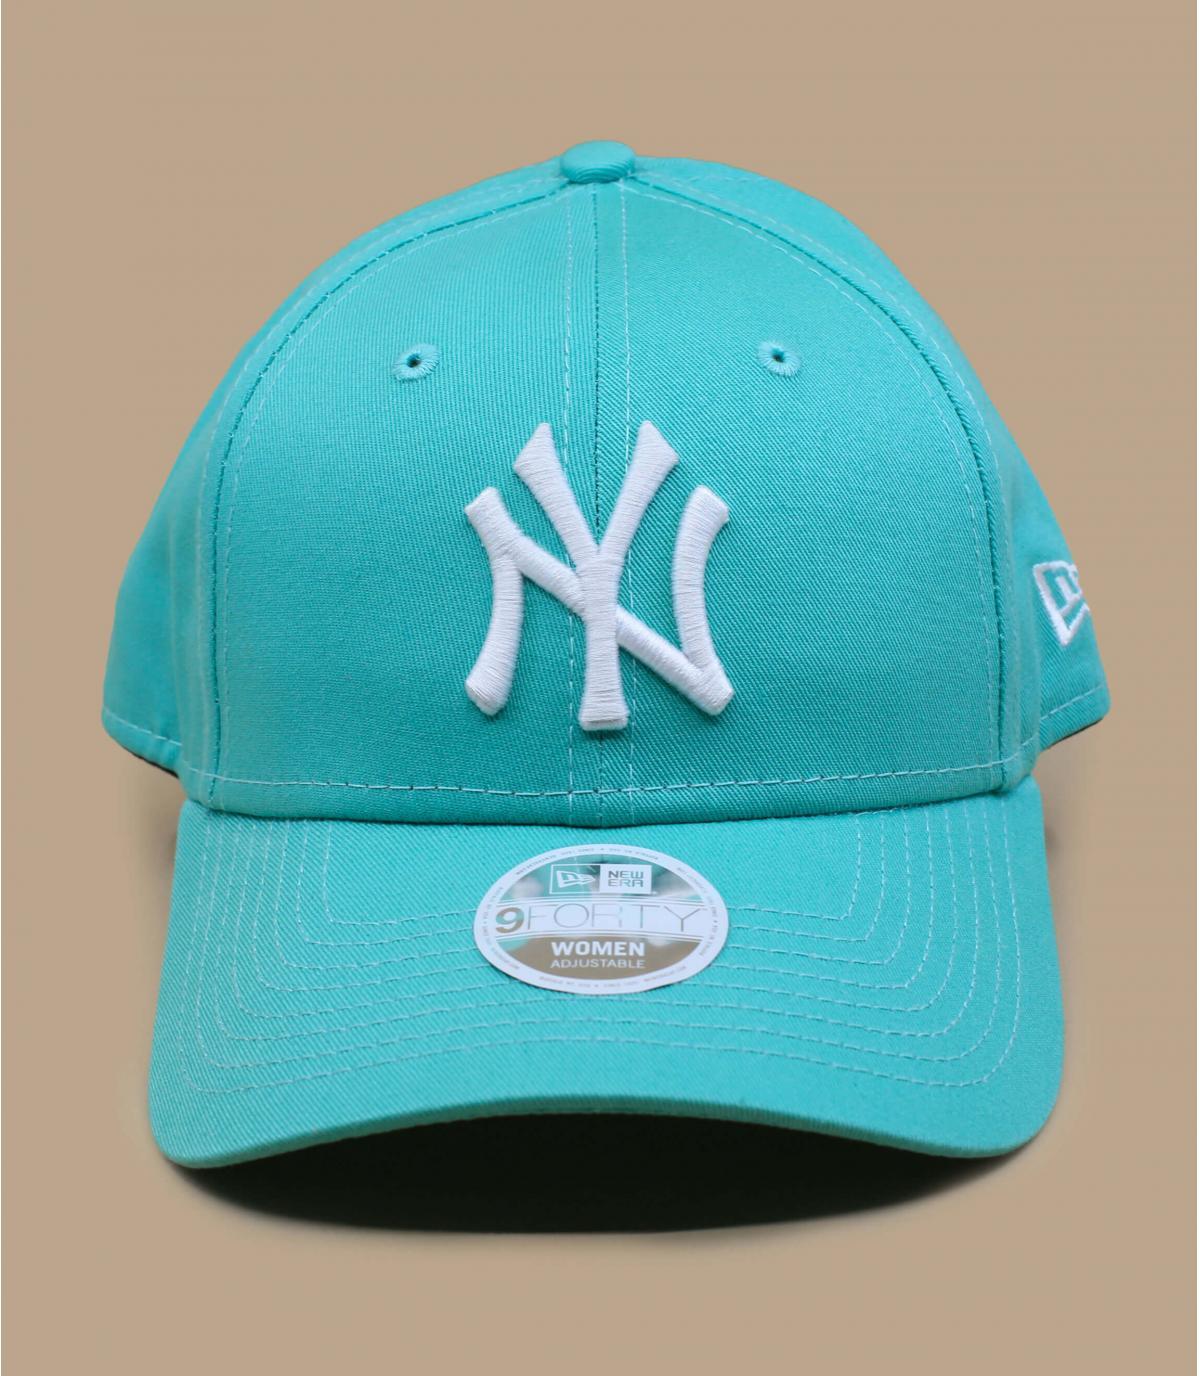 Detalles Wmns League Ess 940 NY neo mint imagen 2